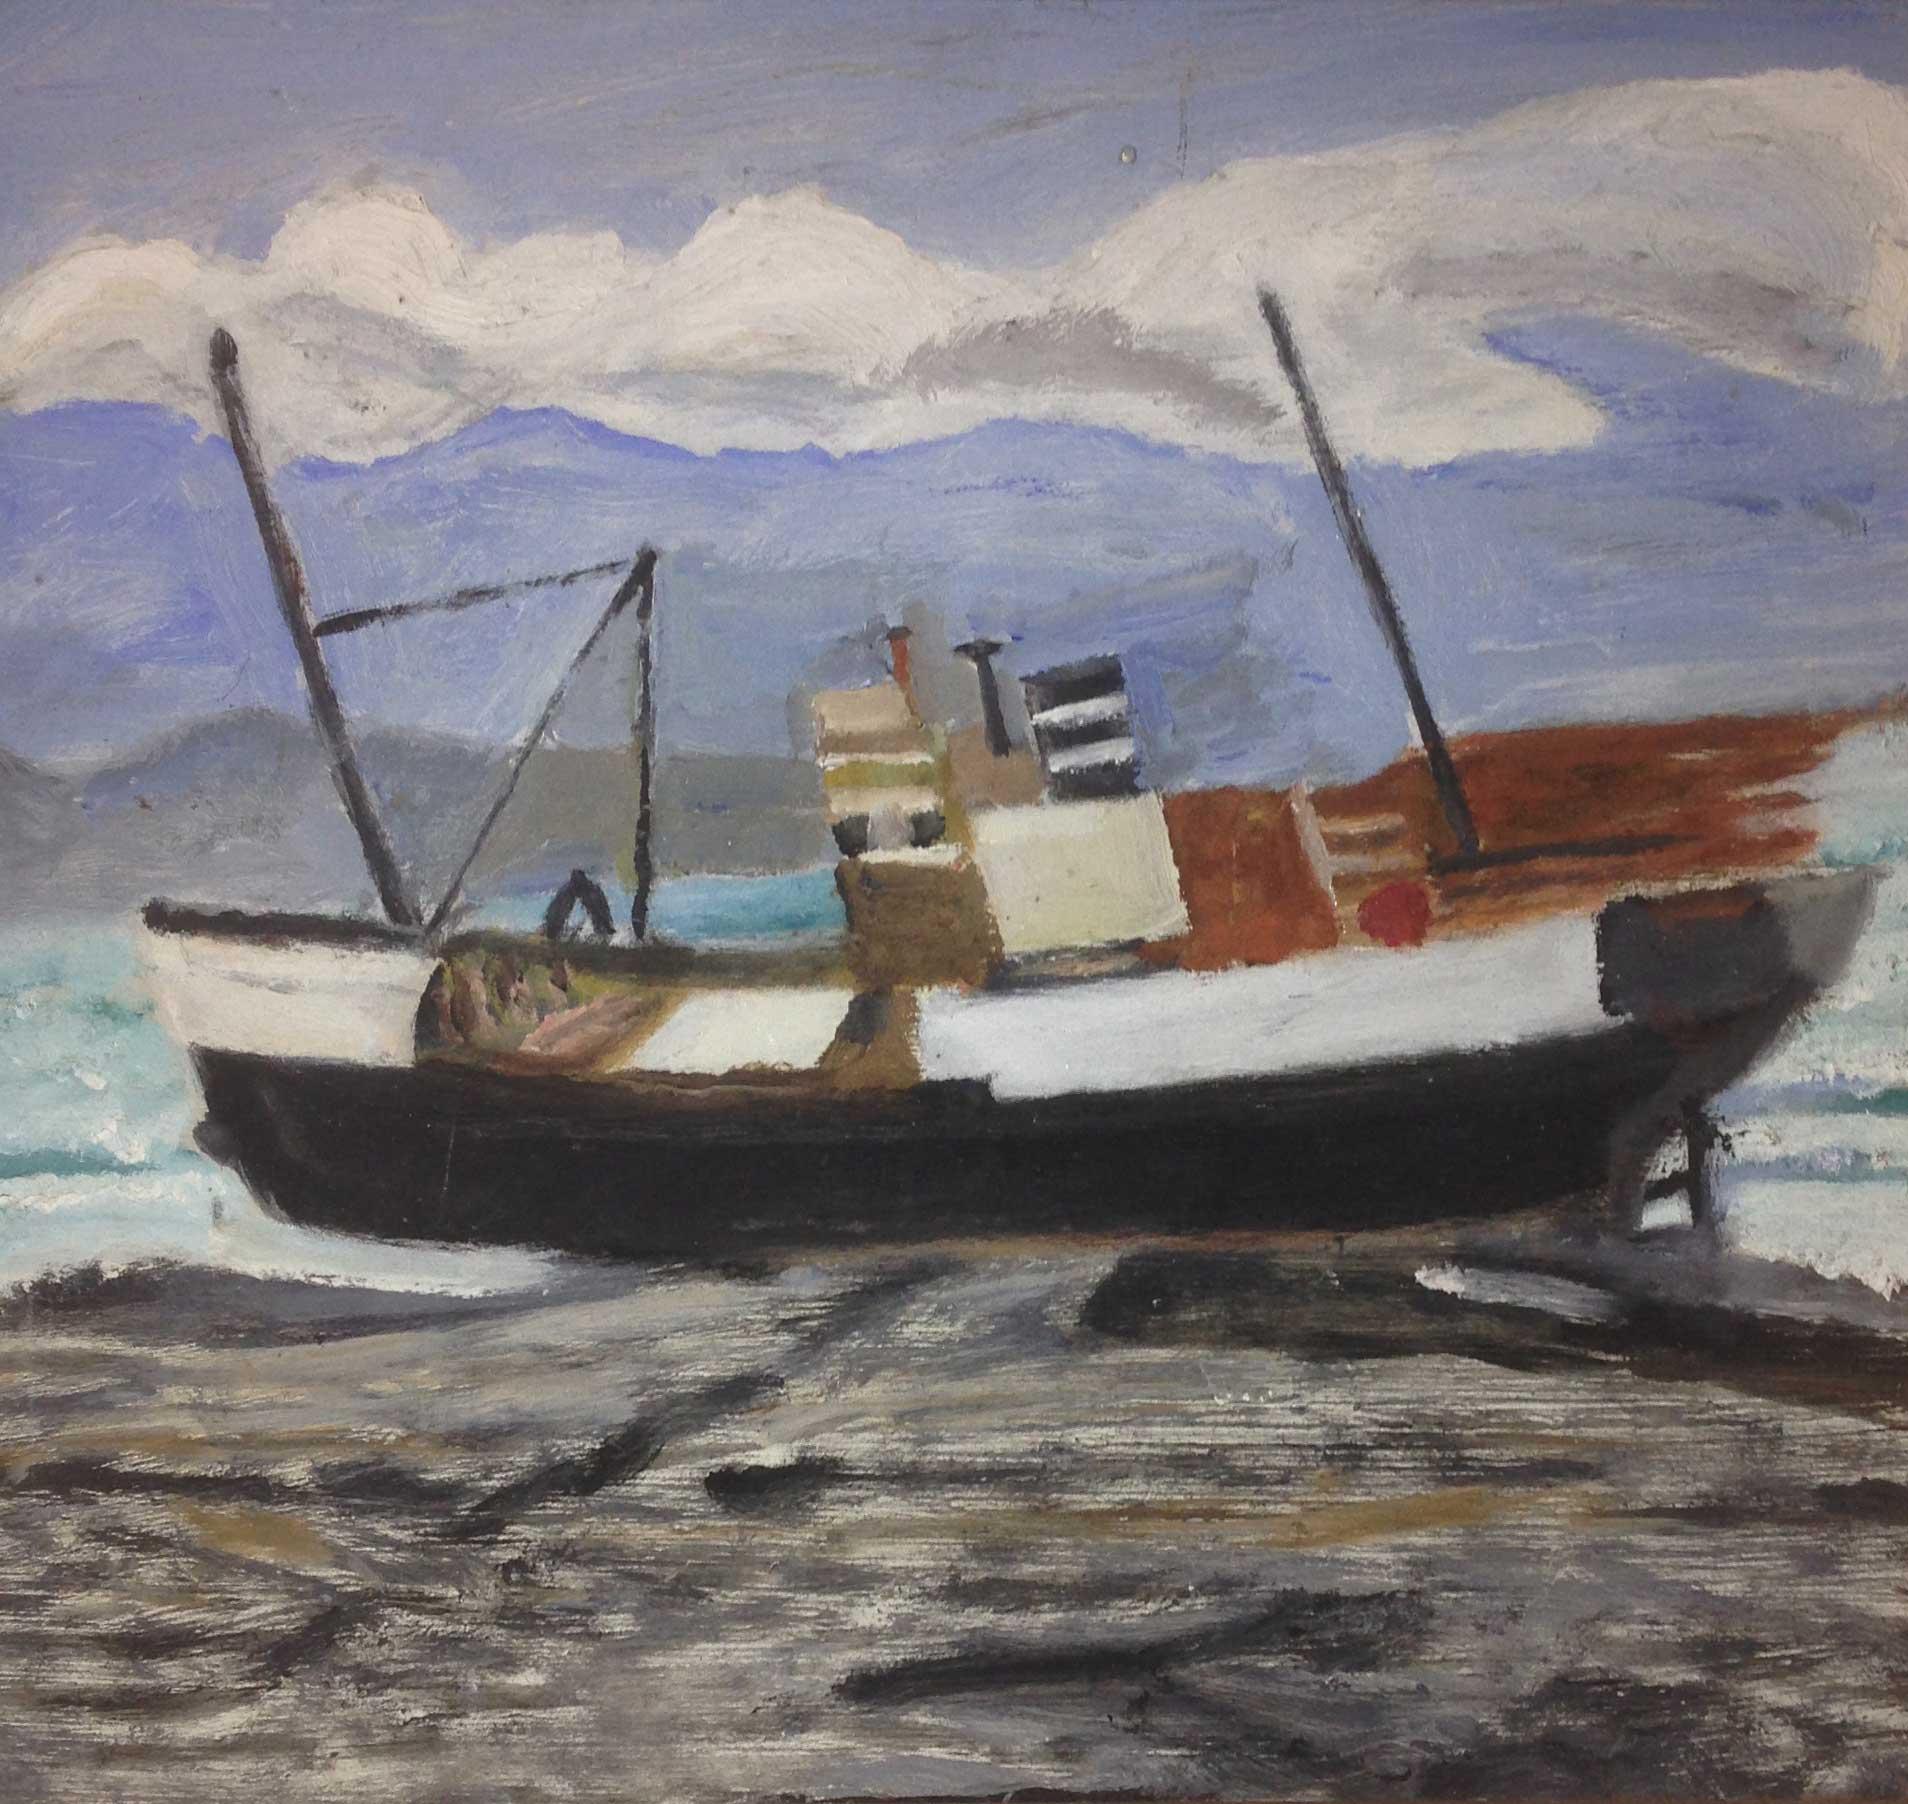 Painting of MV Norholmen, artist unknown